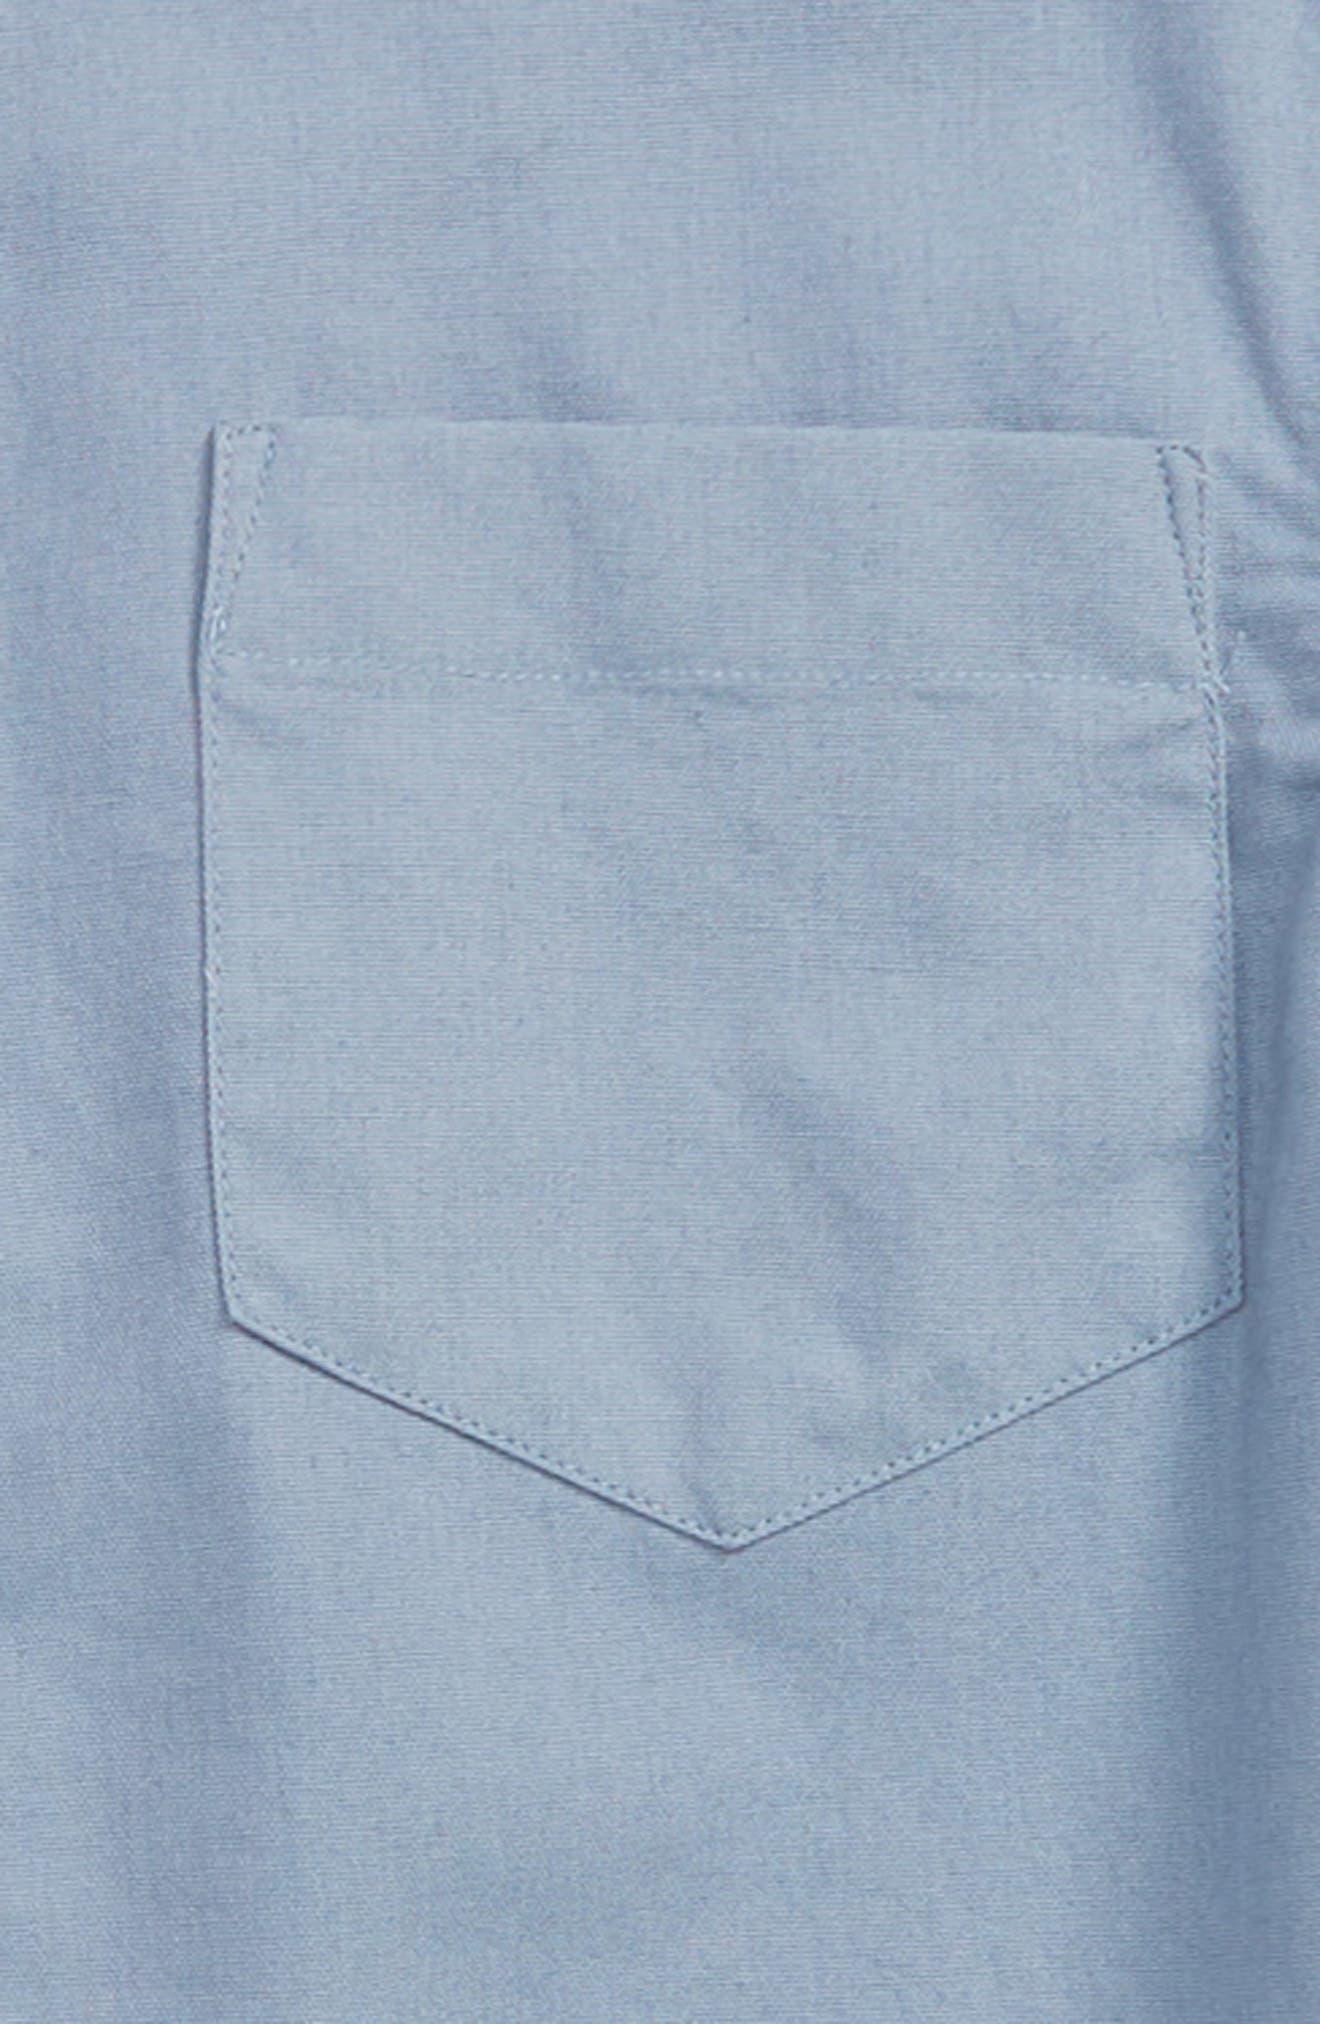 Knit & Woven Shirt,                             Alternate thumbnail 2, color,                             Blue Stonewash